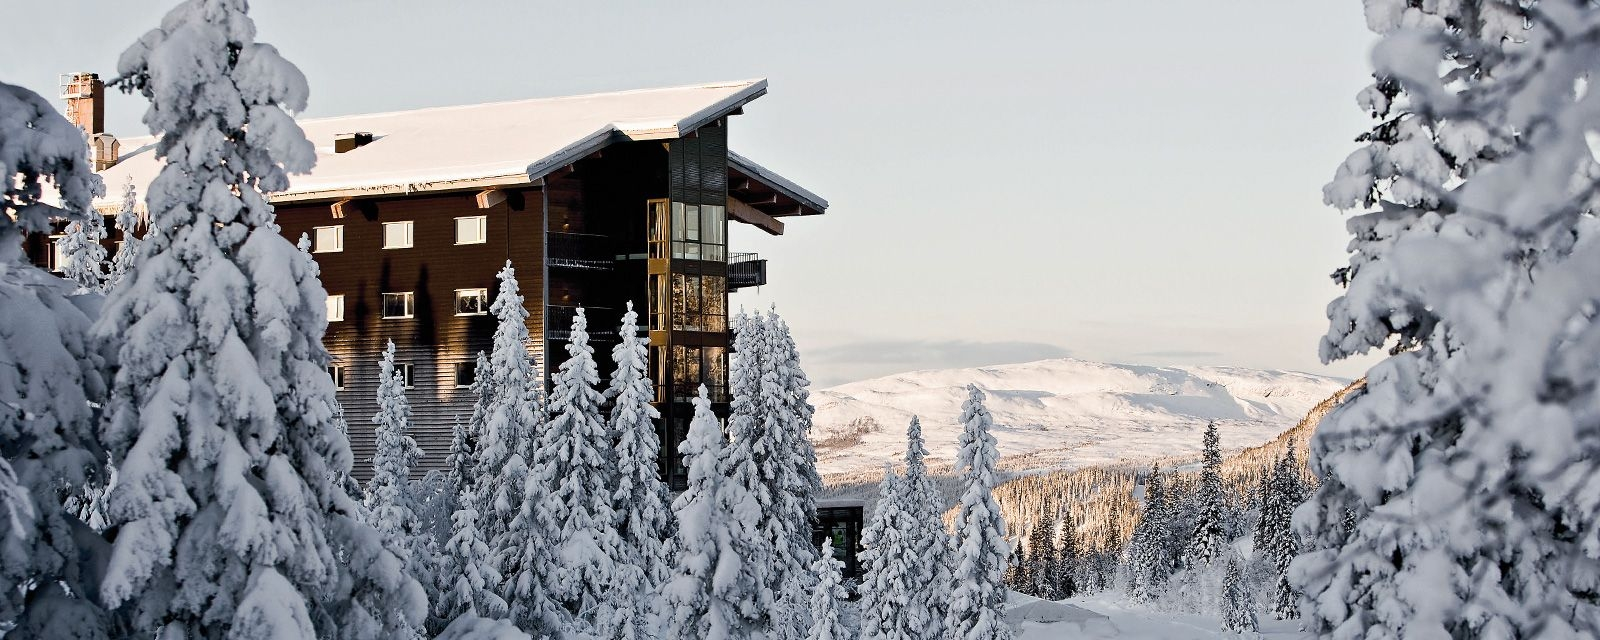 copperhill-mountain-lodge-architecture-landscape-view-by-winter-q-01.jpg